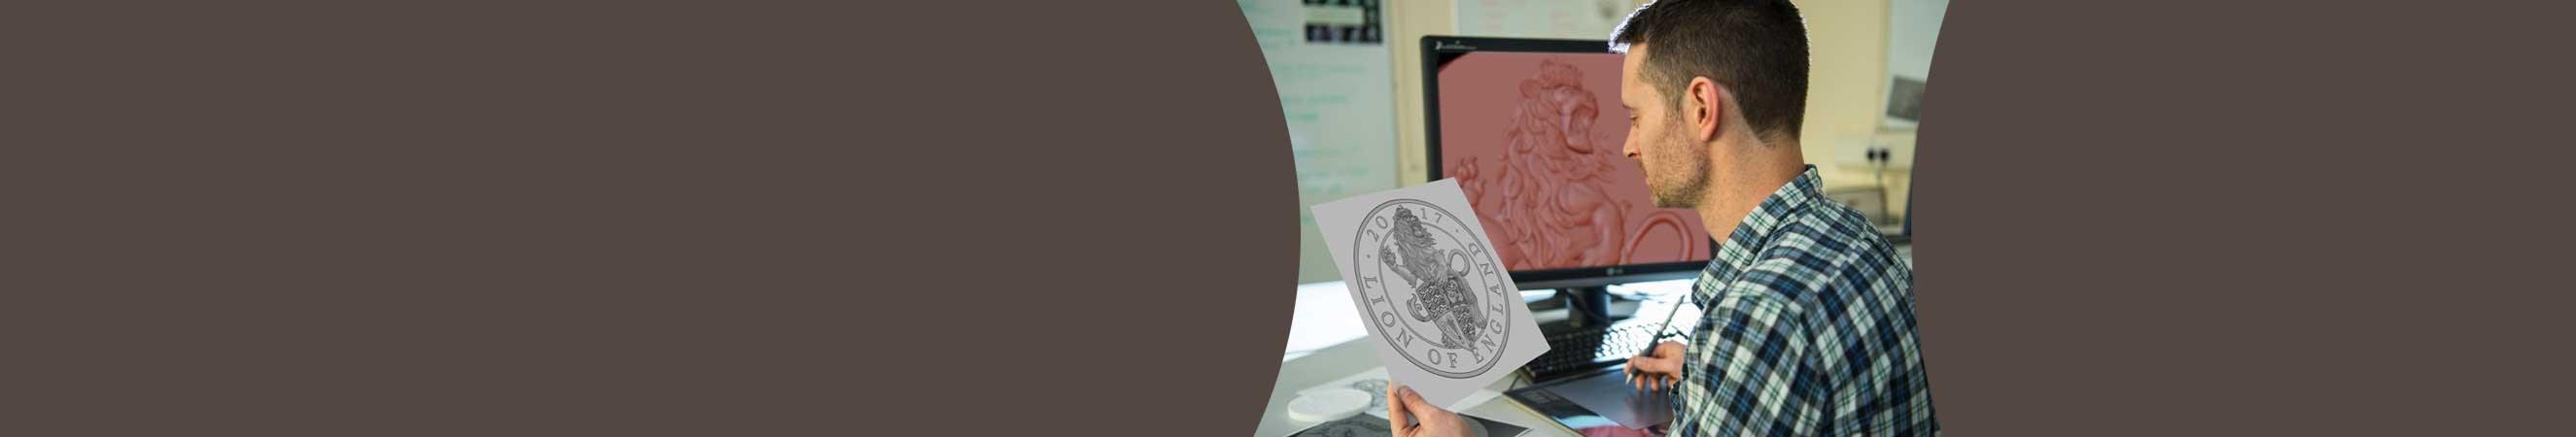 Meet the Designer of Queens Beast | The Royal Mint